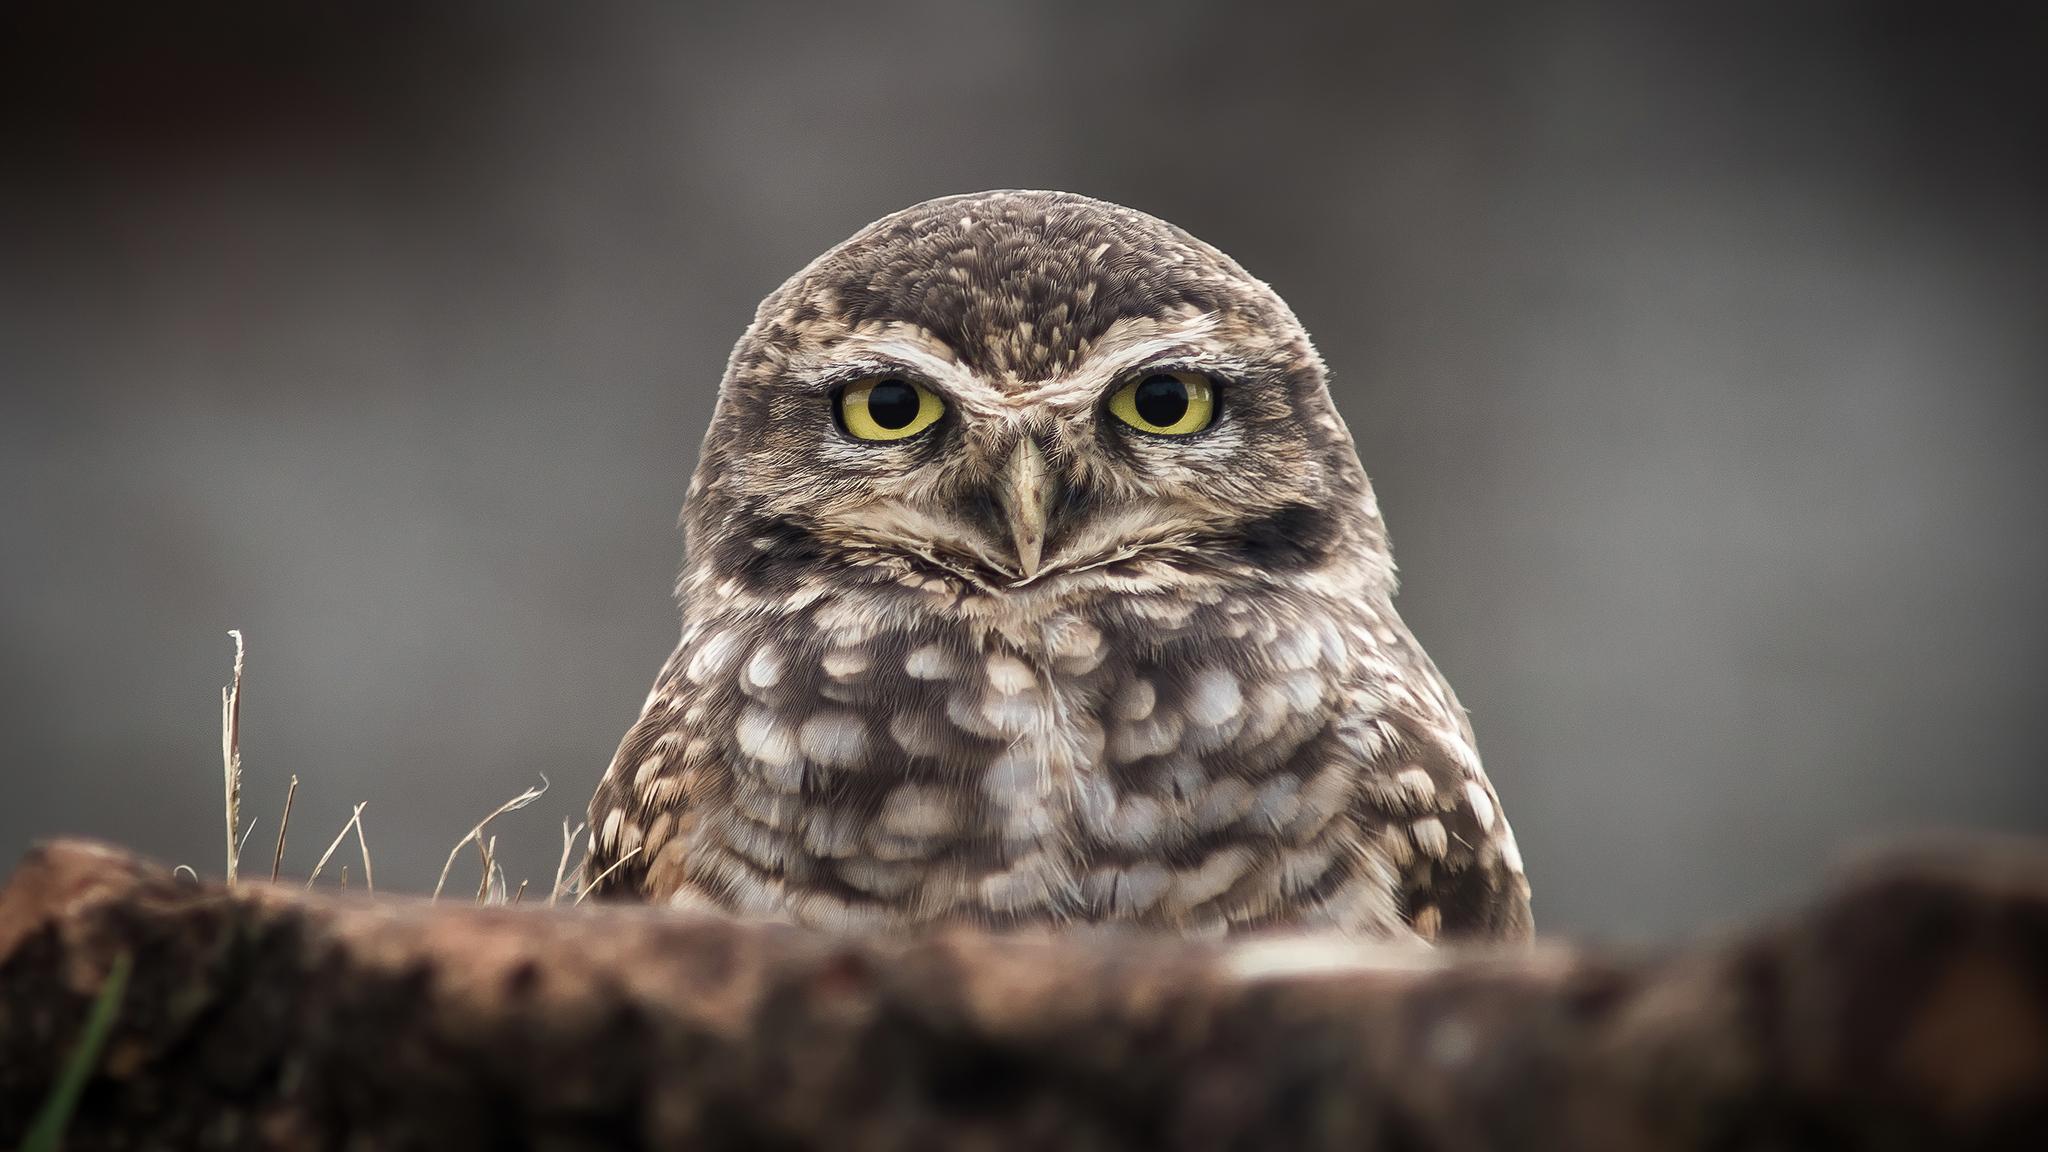 owl-portrait-4k-2p.jpg